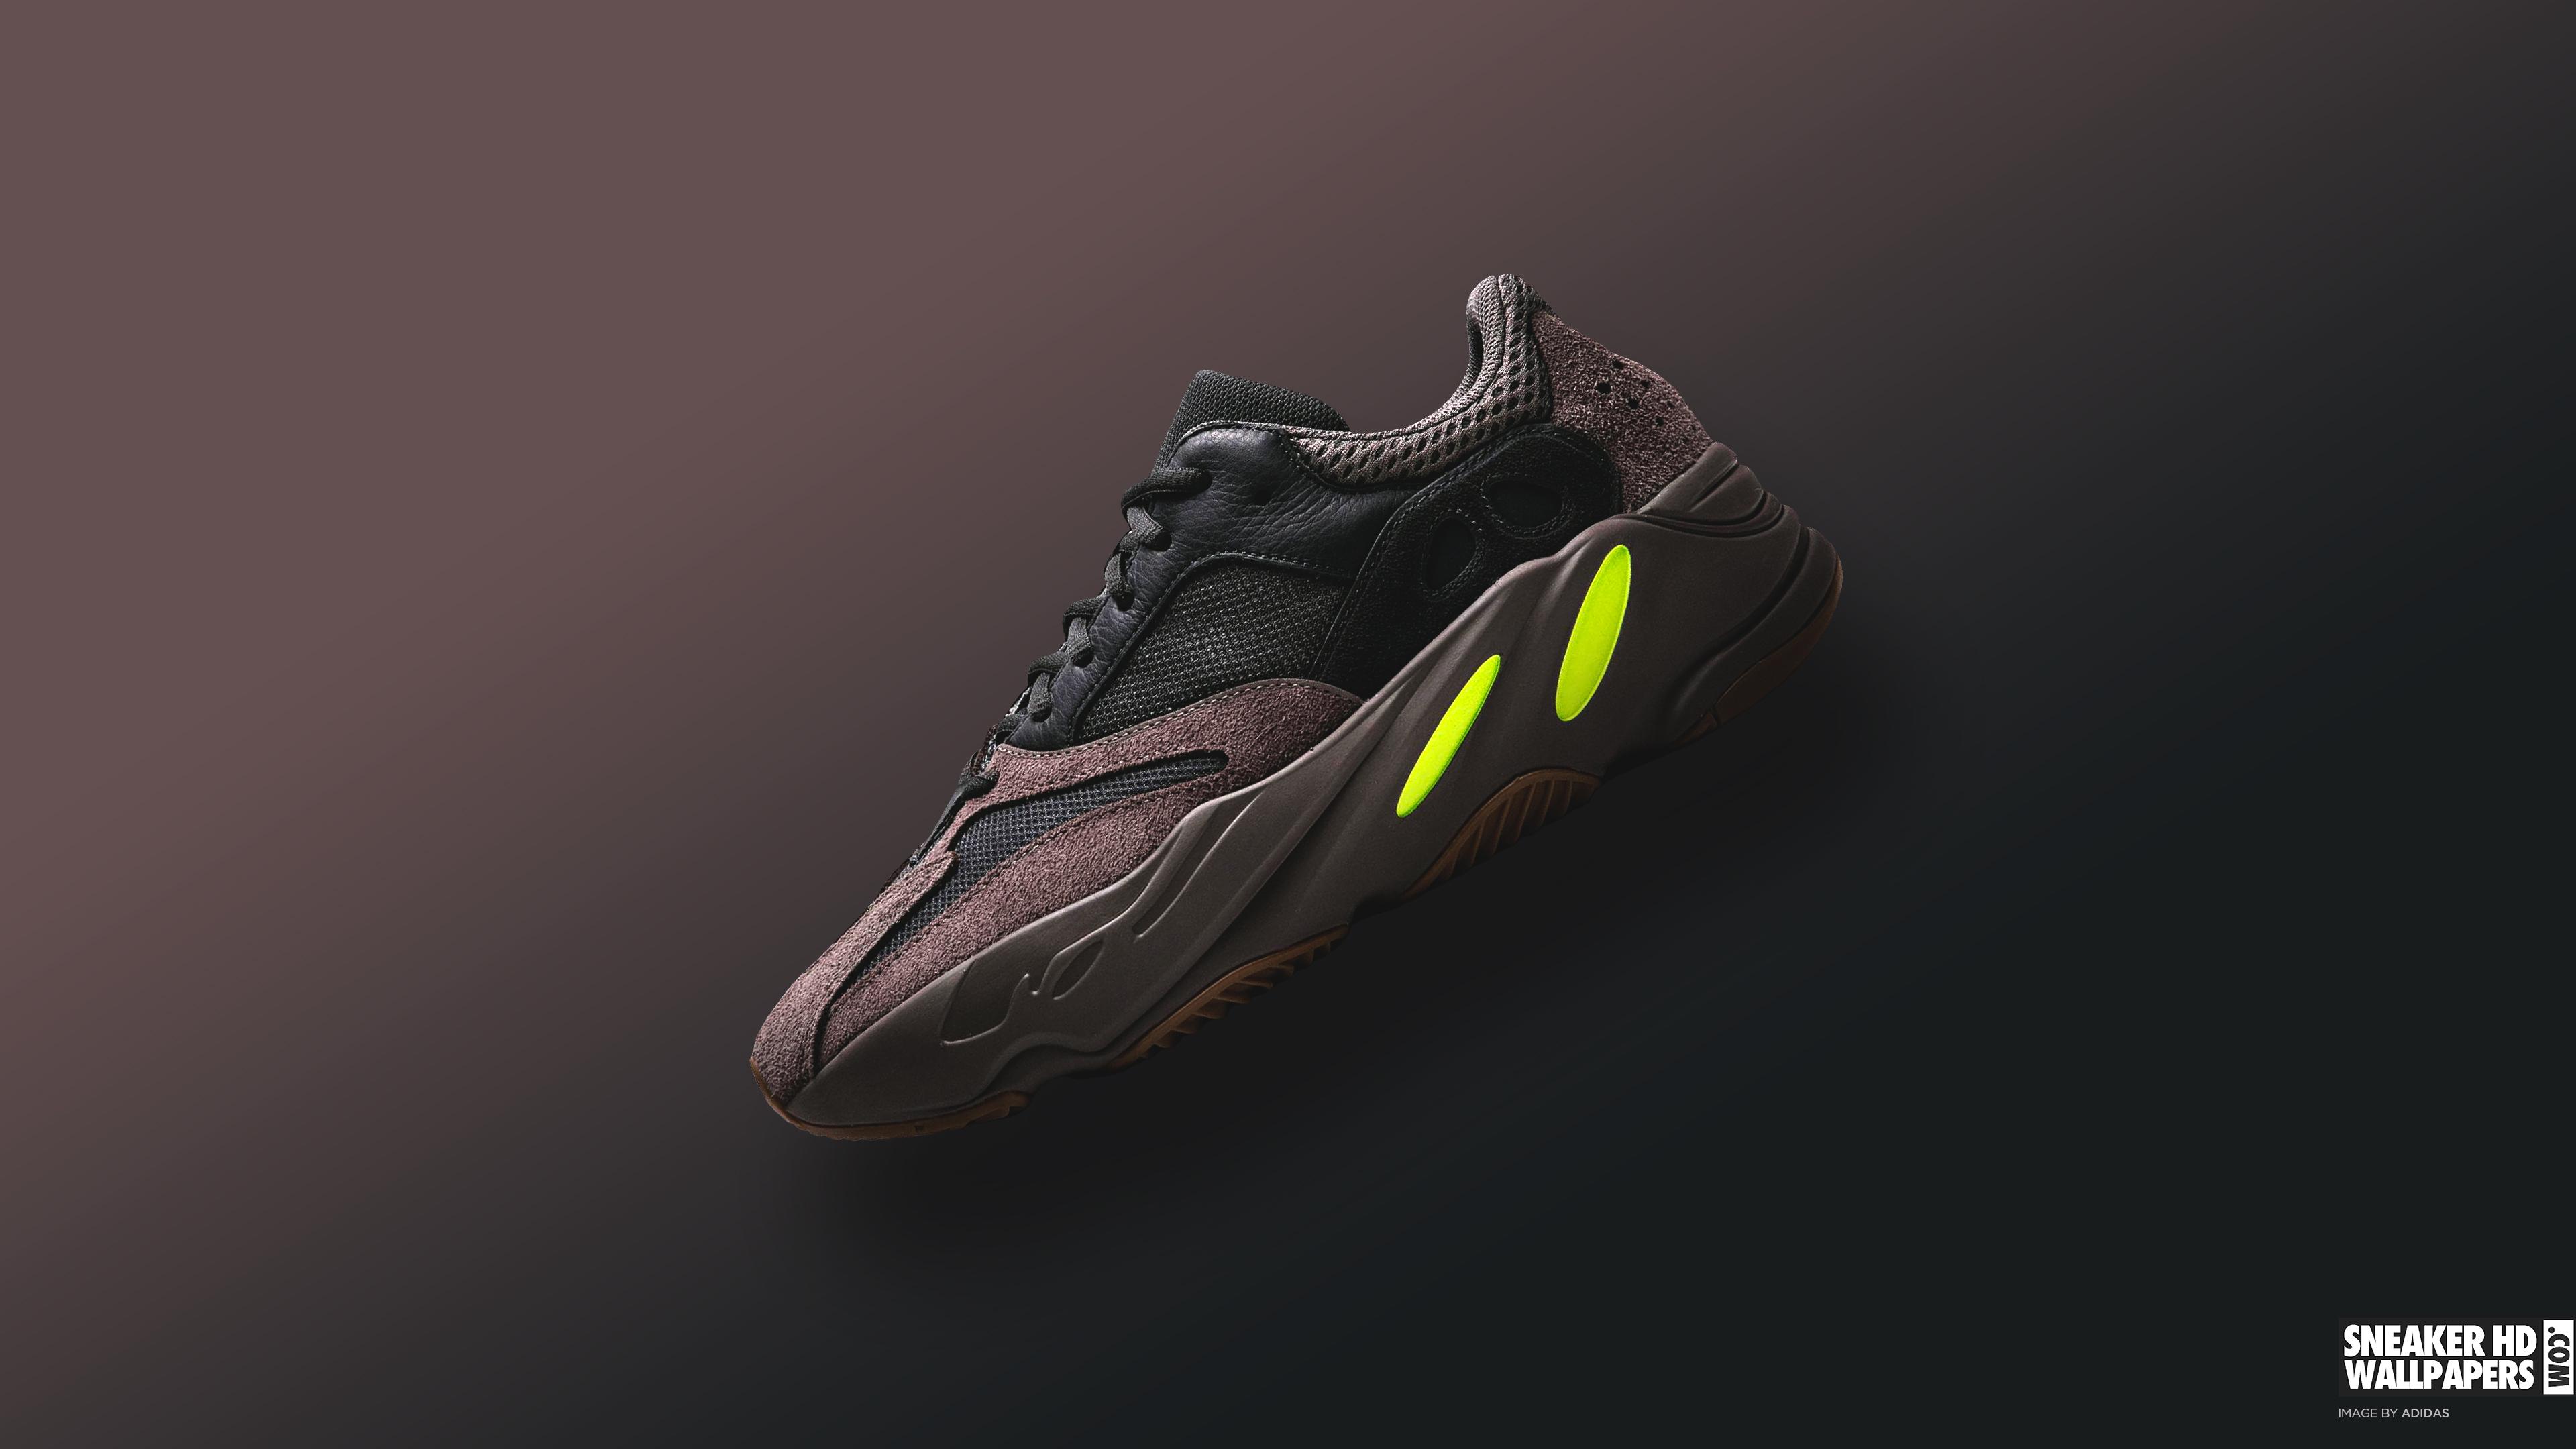 647217385089b SneakerHDWallpapers.com – Your favorite sneakers in HD and mobile ...